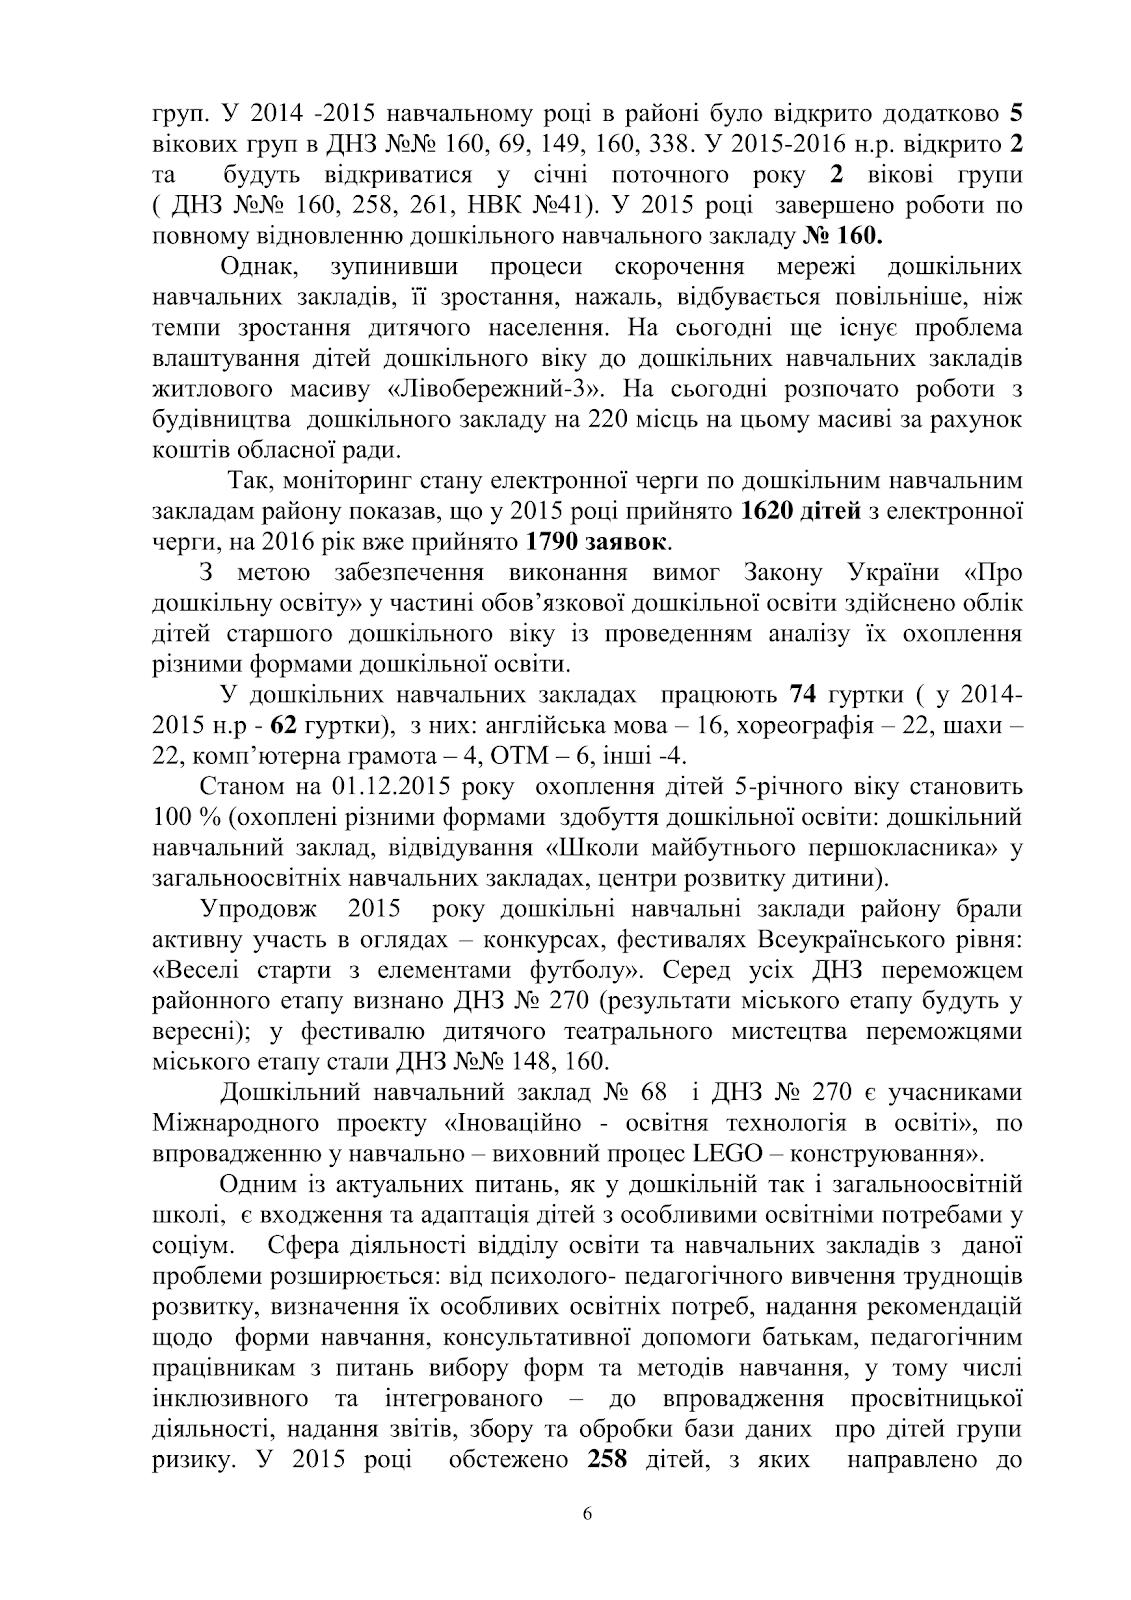 C:\Users\Валерия\Desktop\план 2016 рік\план 2016 рік-006.png